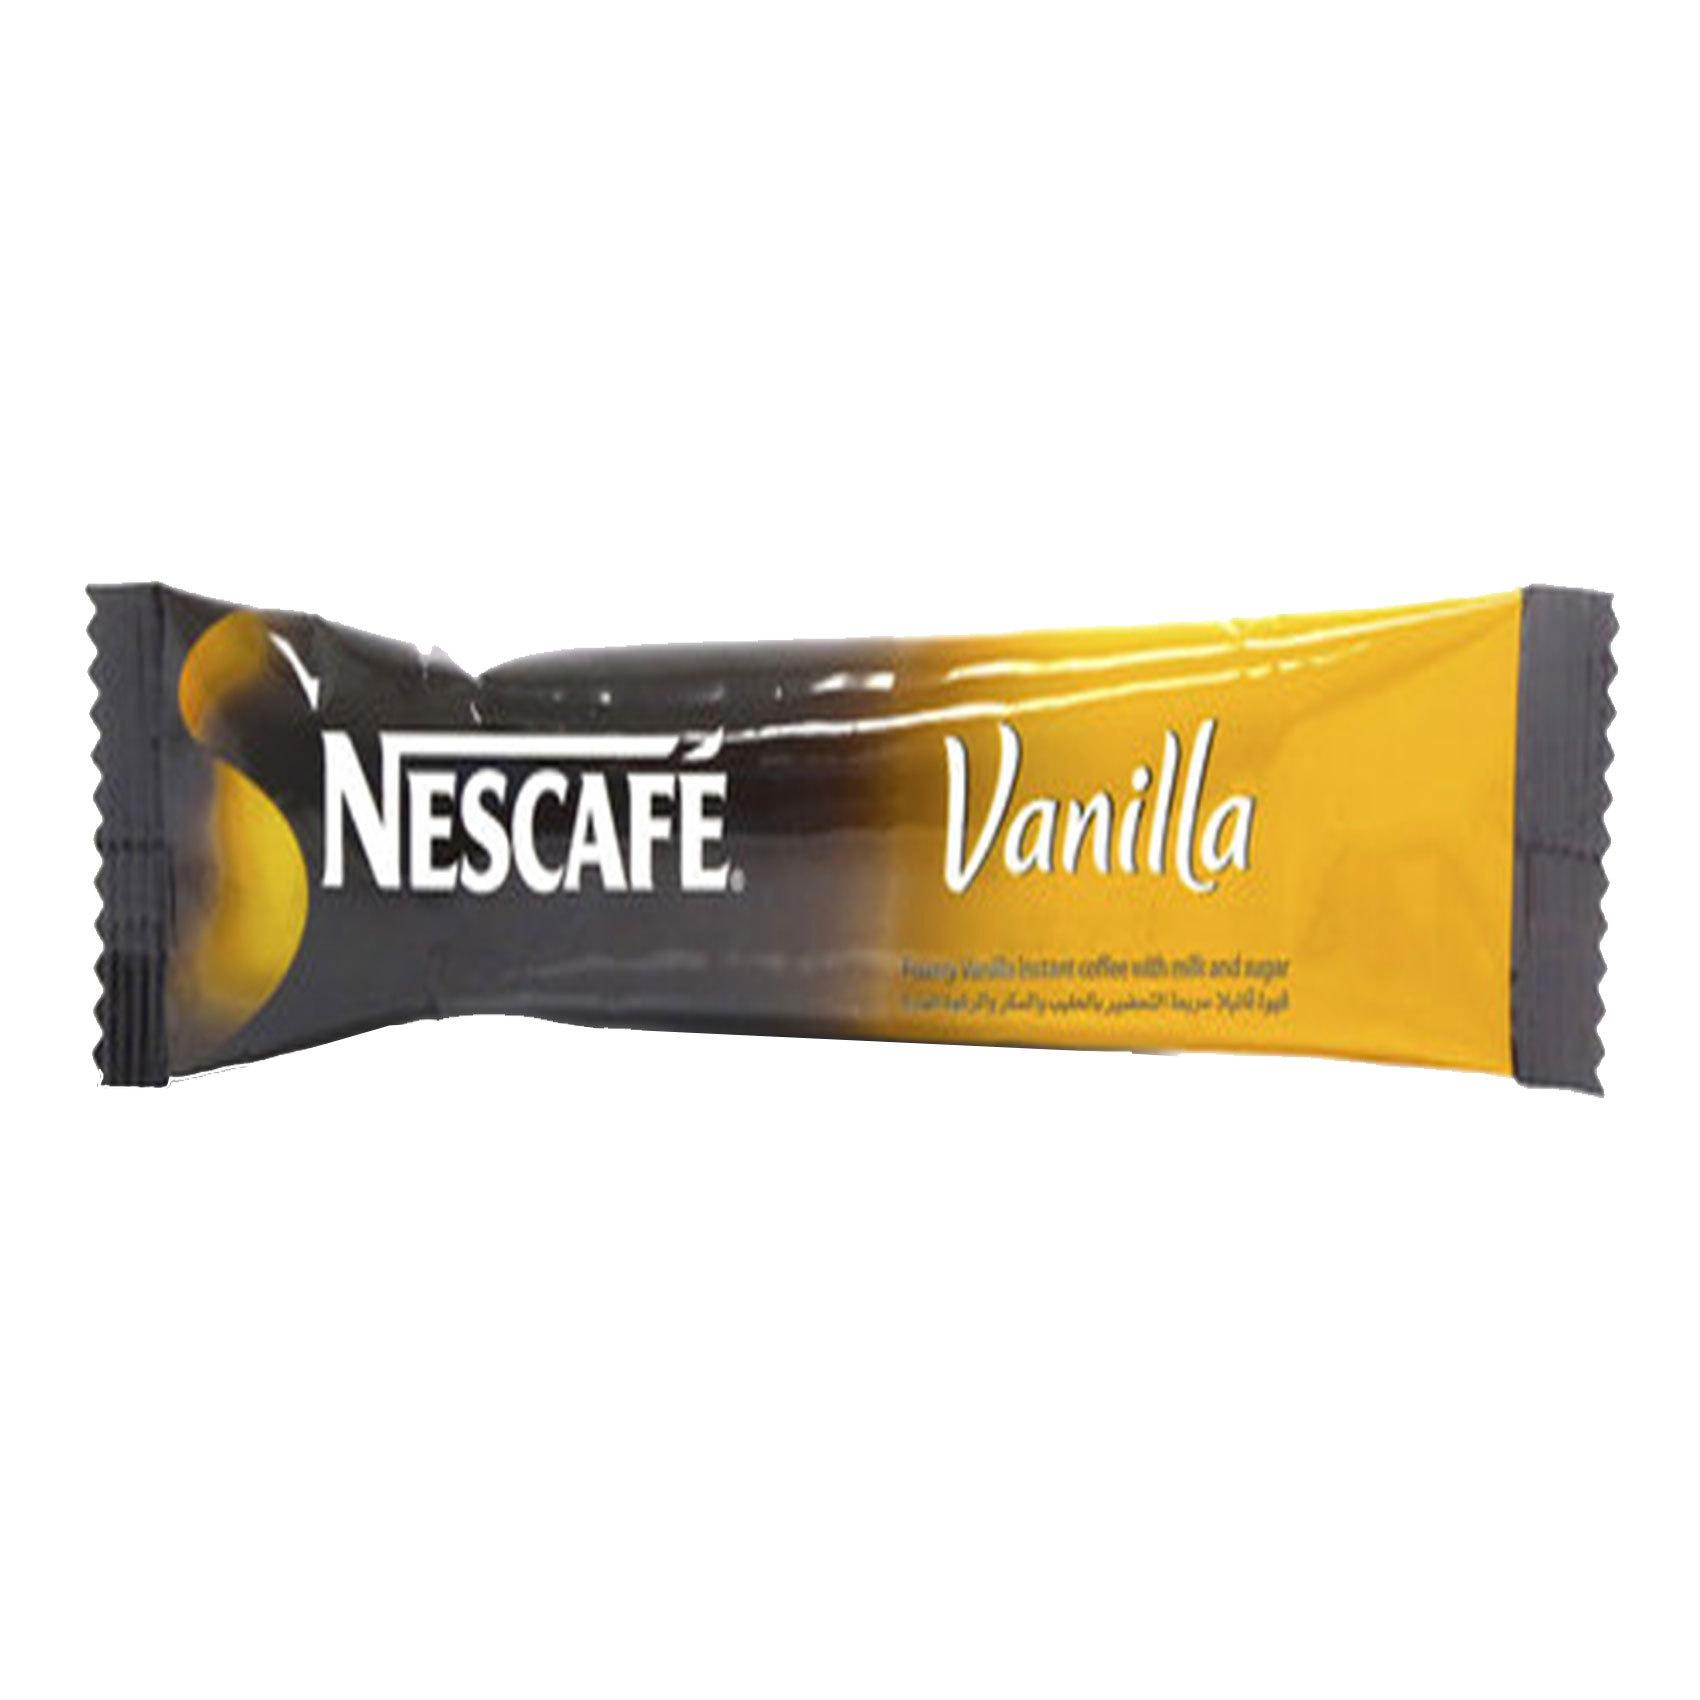 NESCAFE FRENCH VANILLA 18.5GR